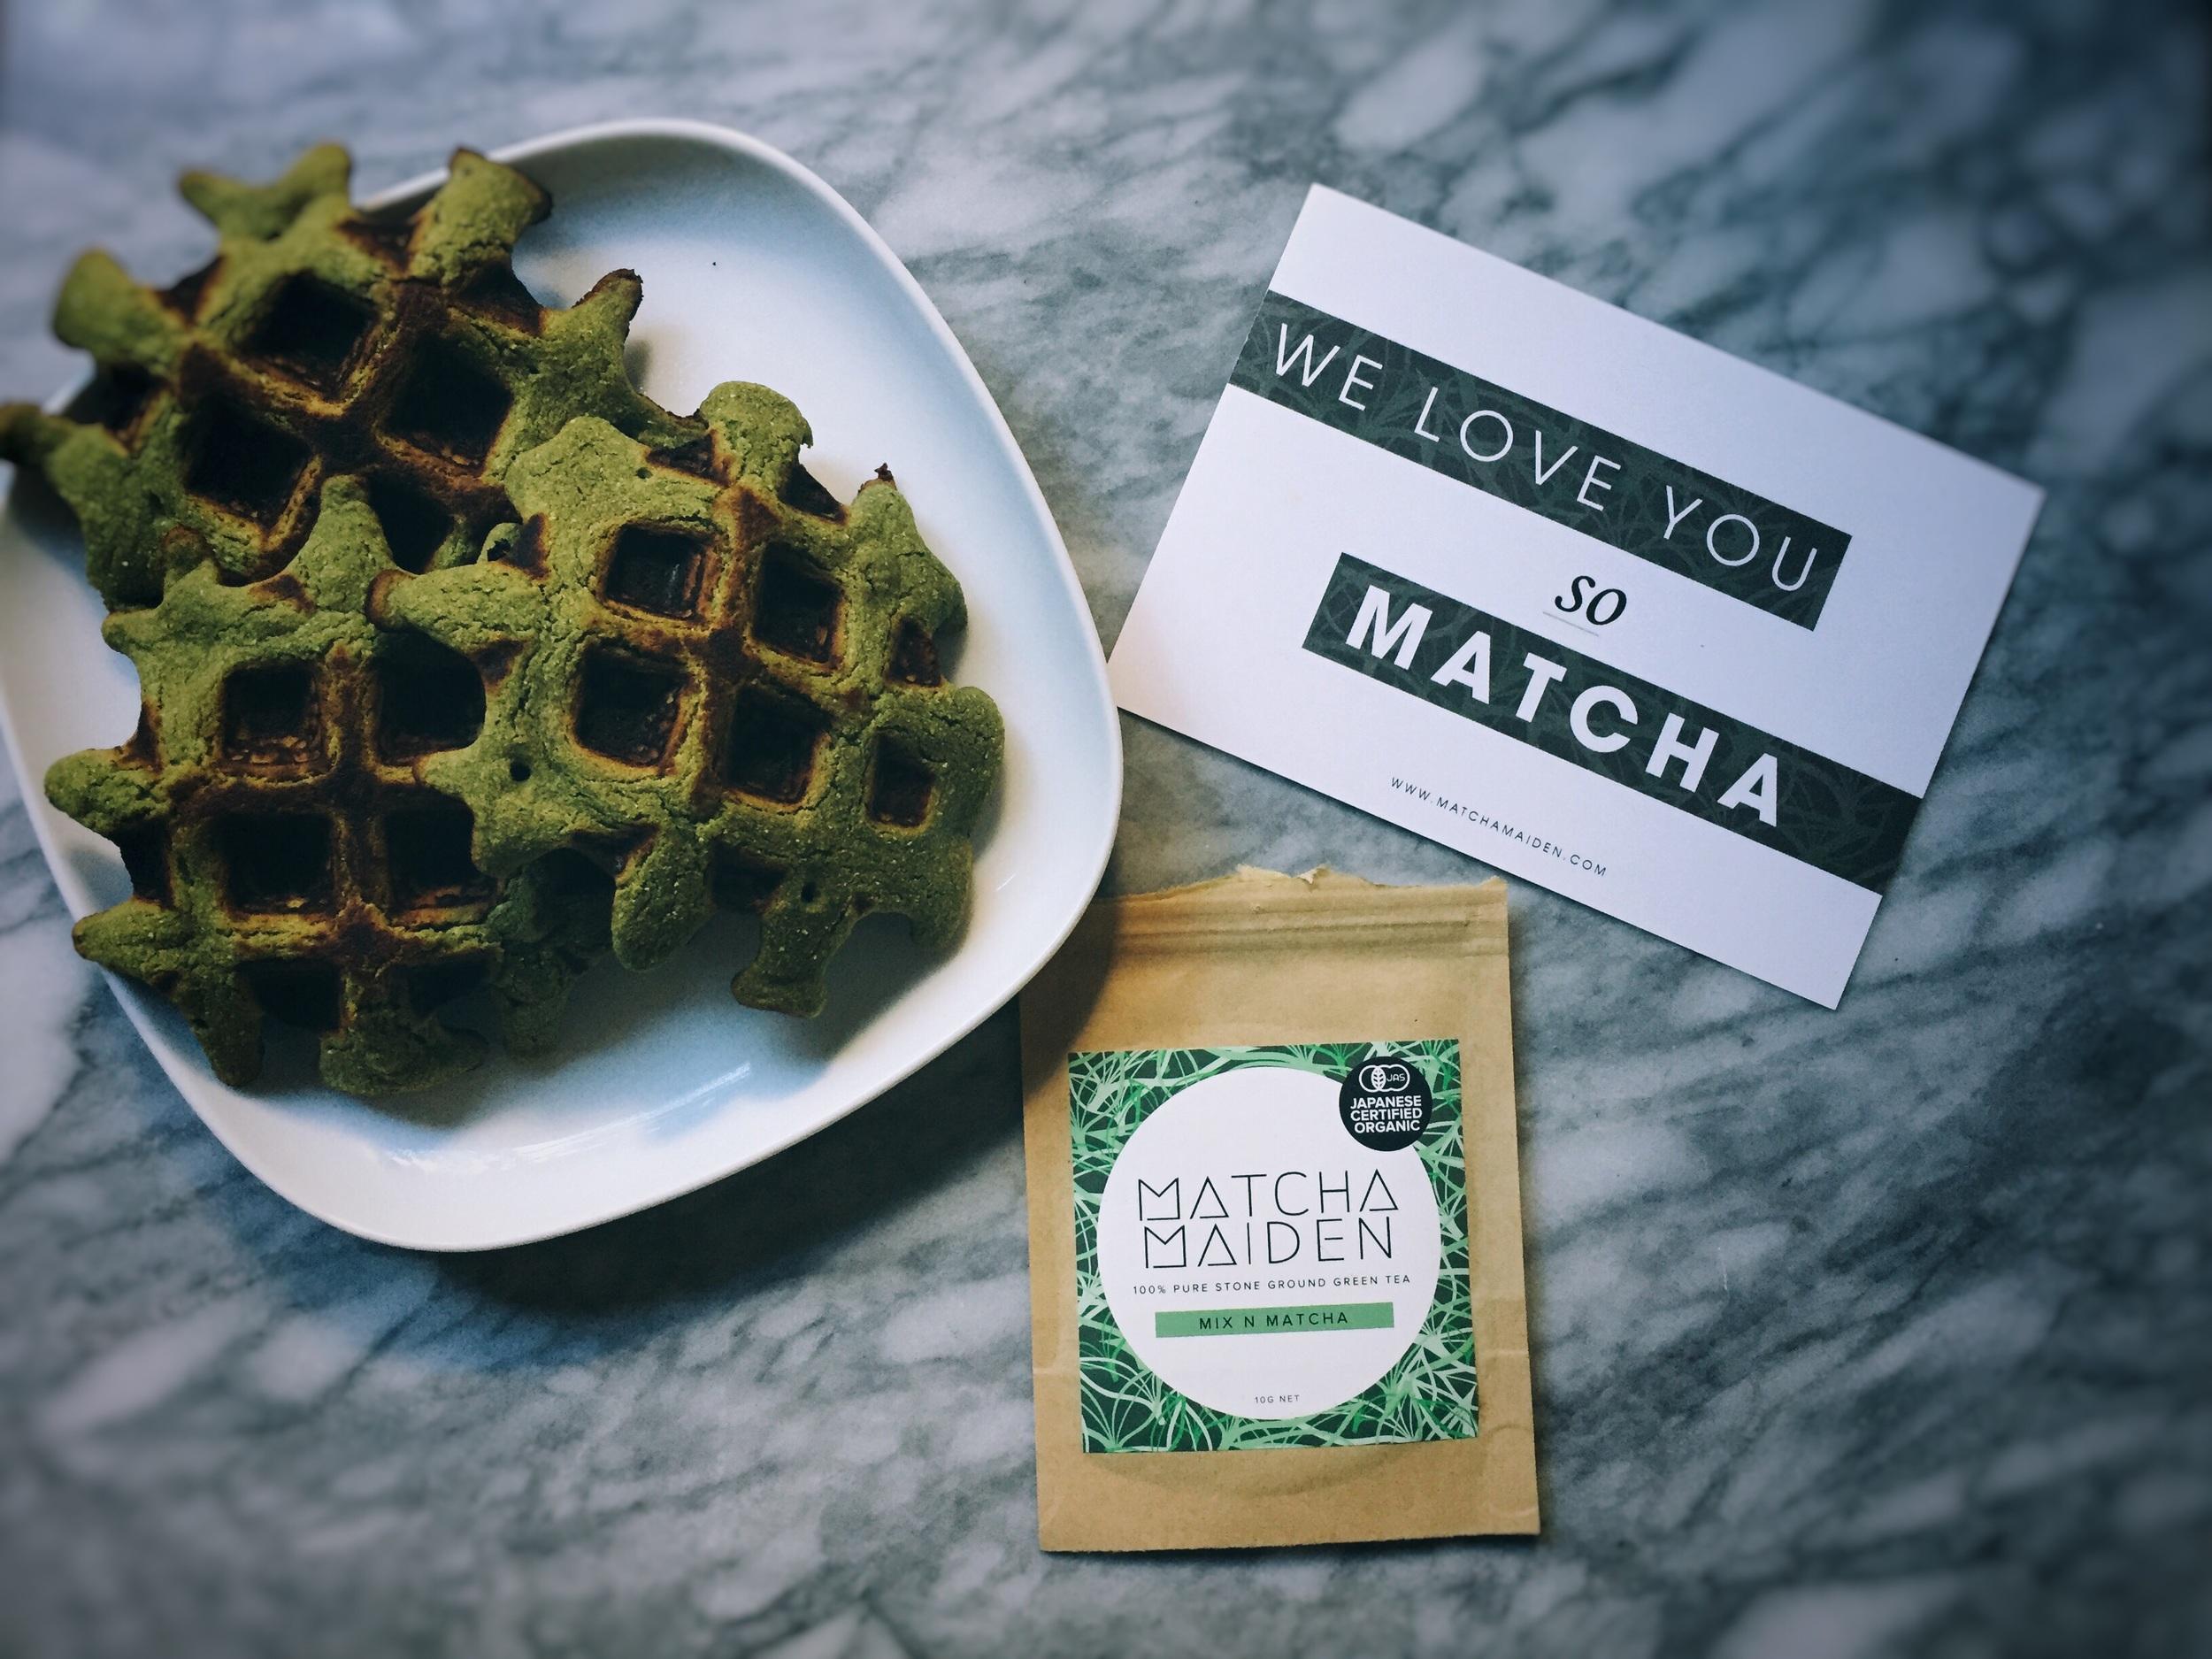 Matcha Green Tea Waffles w/ Matcha Maiden